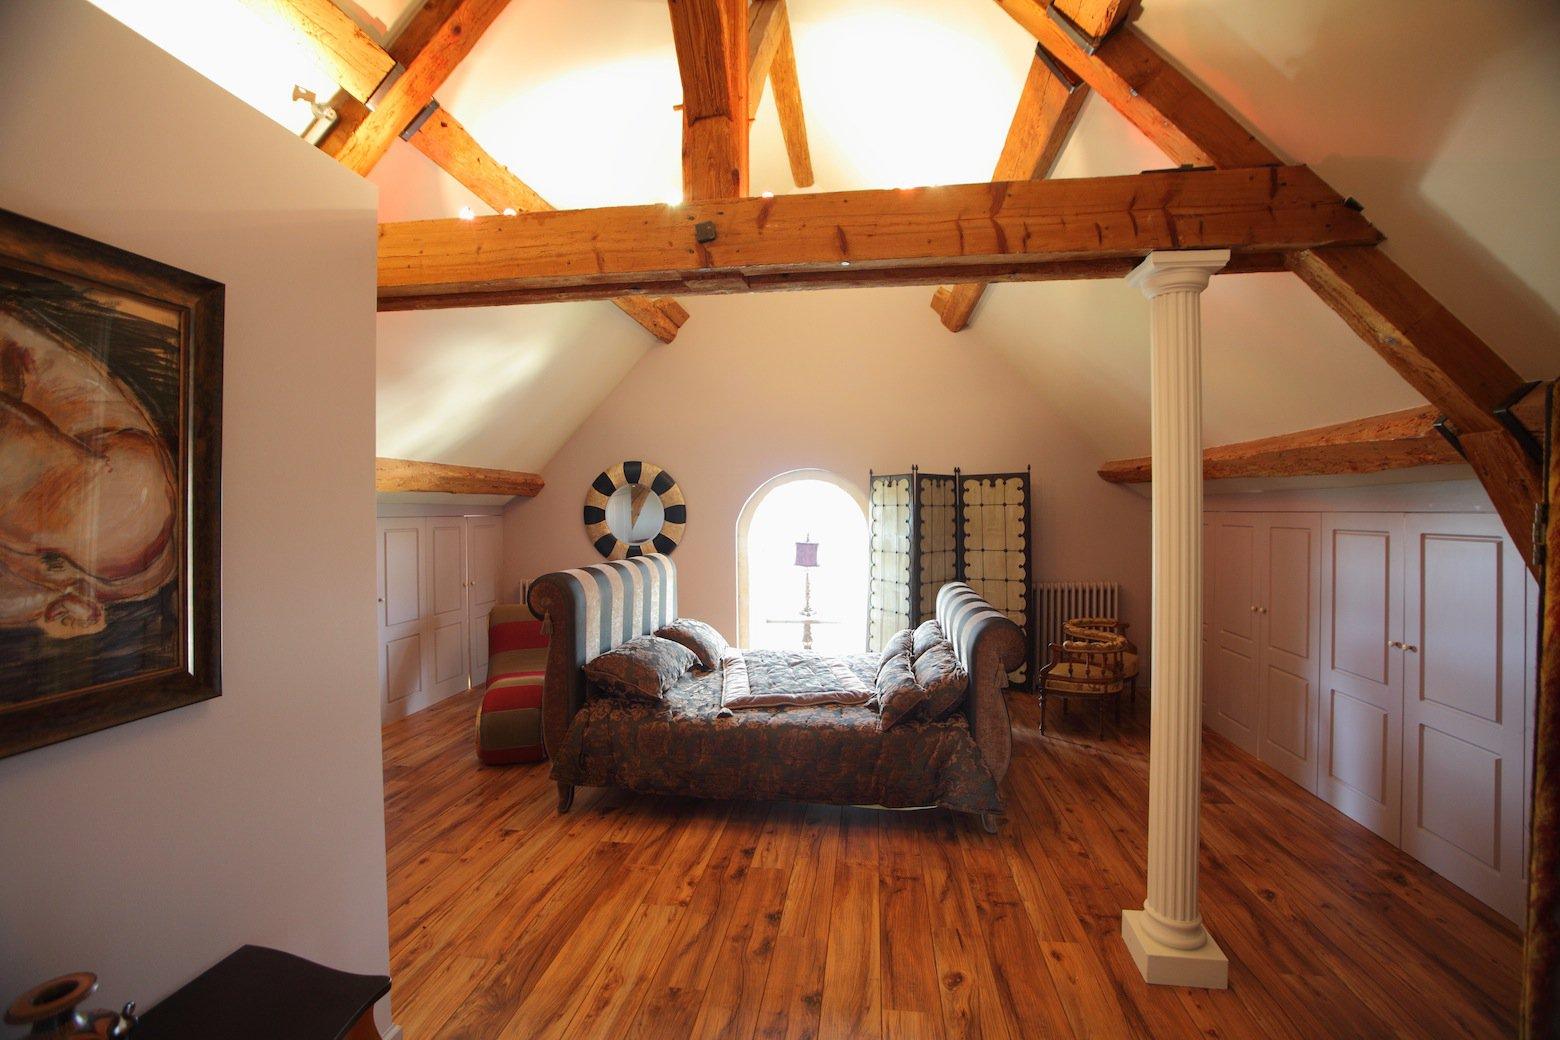 High ceiling, natural light